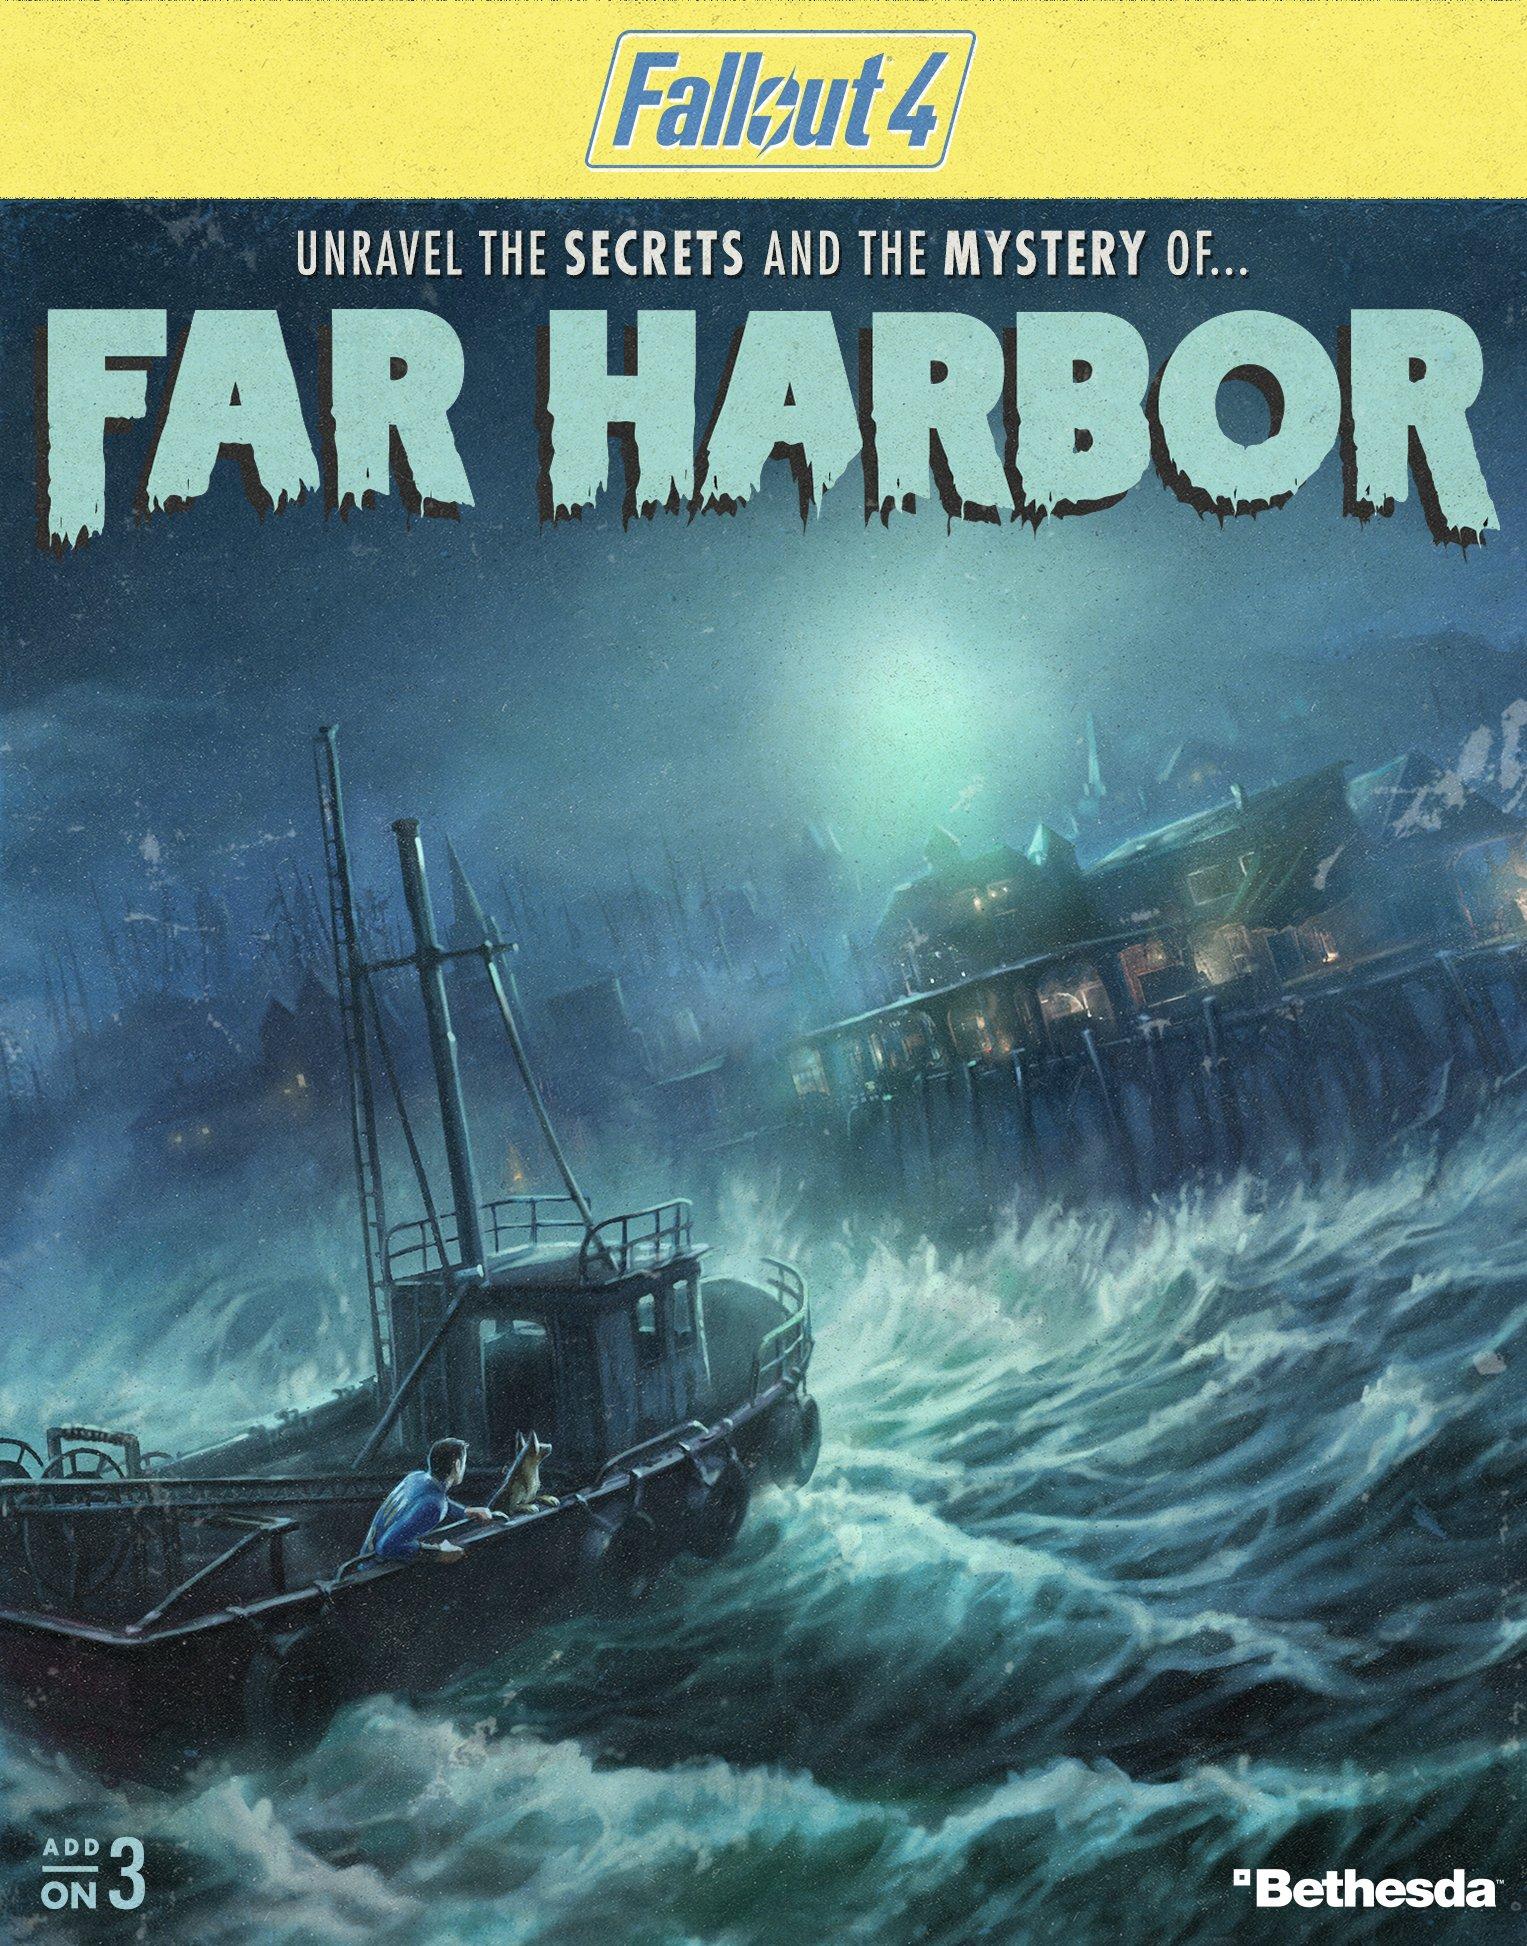 Fallout 4: Far Harbor (PS4) Review 4